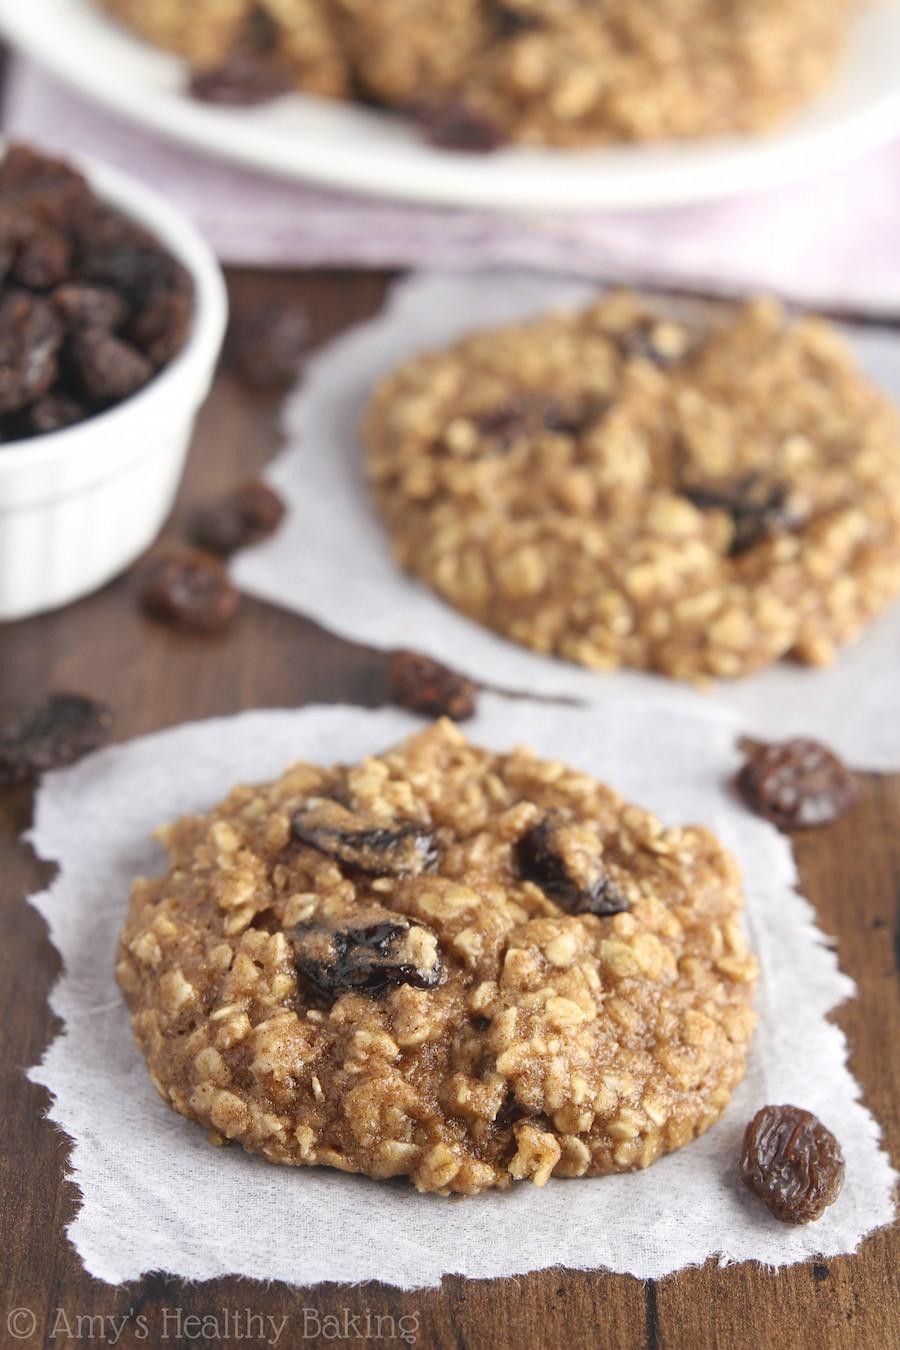 Healthy Oatmeal Raisin Cookies  The Ultimate Healthy Soft & Chewy Oatmeal Raisin Cookies